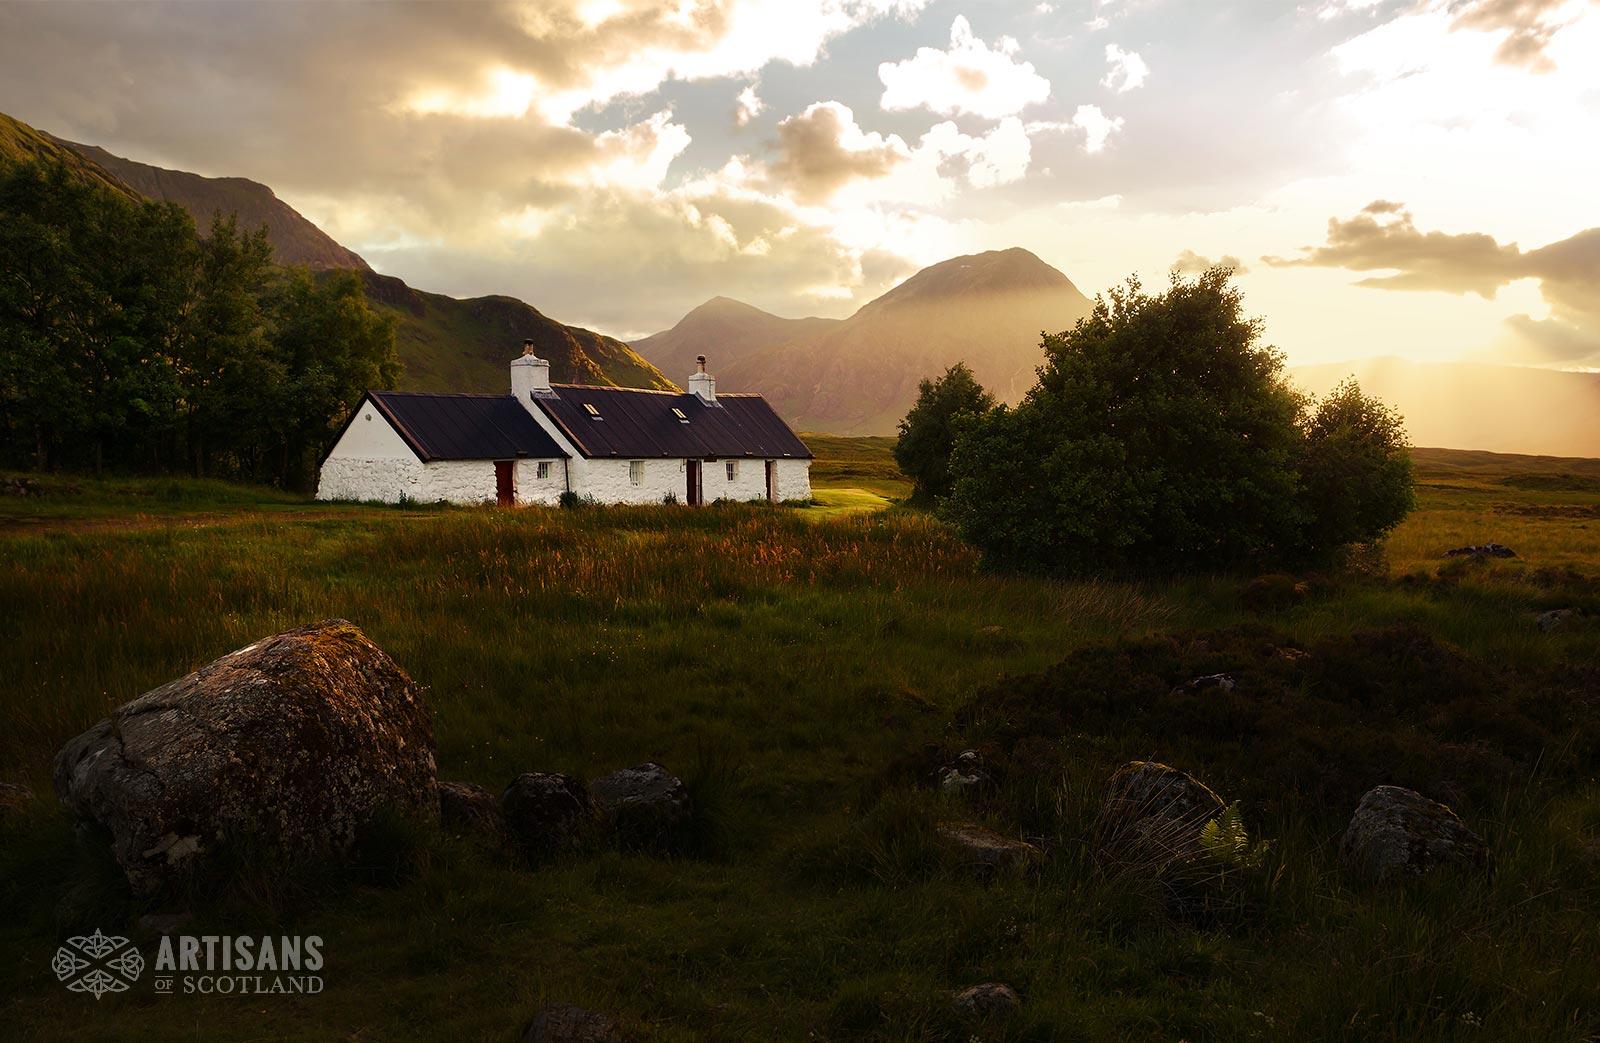 Blackrock Cottage Glencoe Sunset - The most beautiful places in Scotland